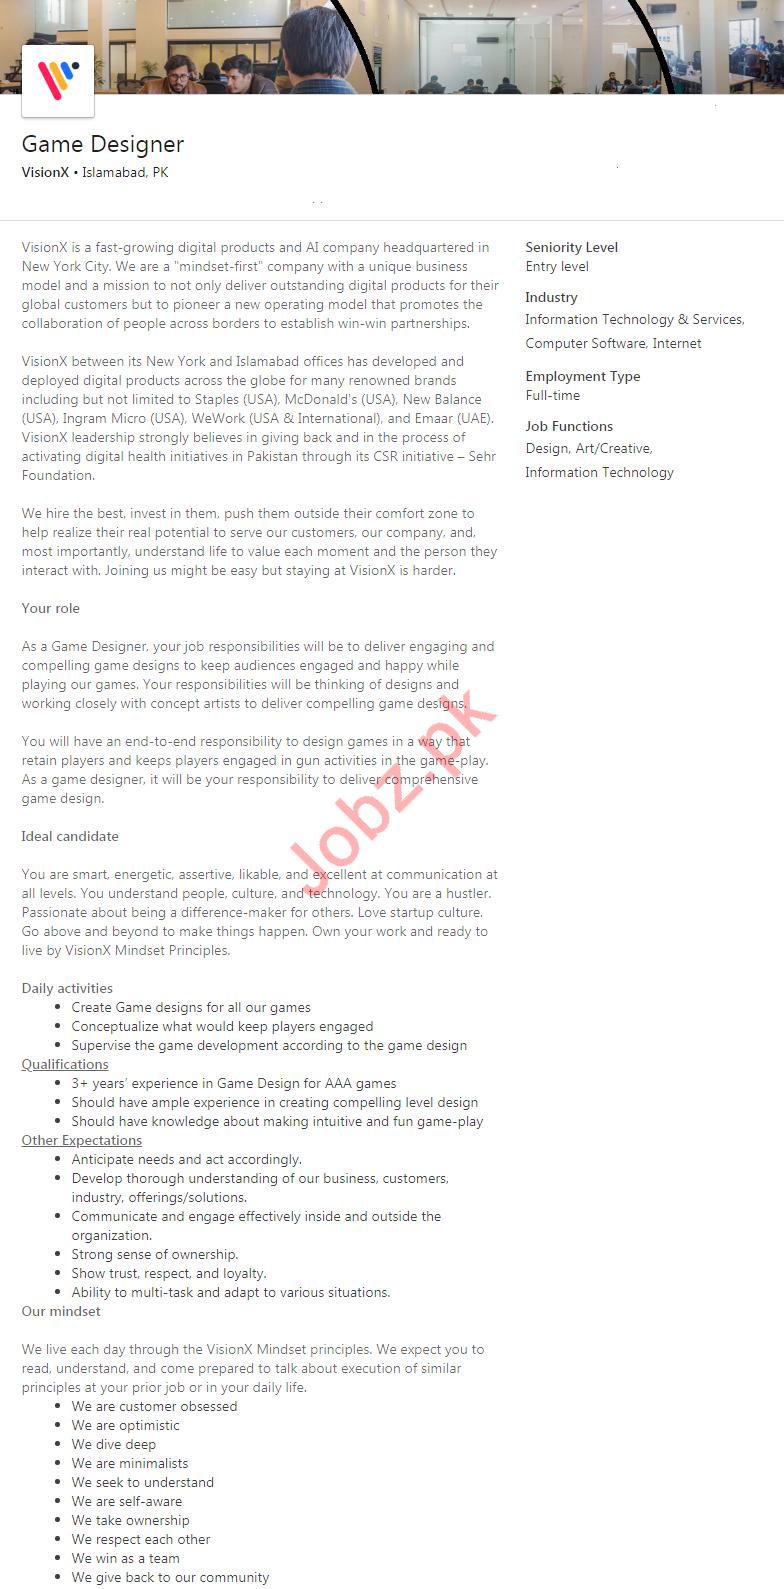 Game Designer Jobs in VisionX Technologies